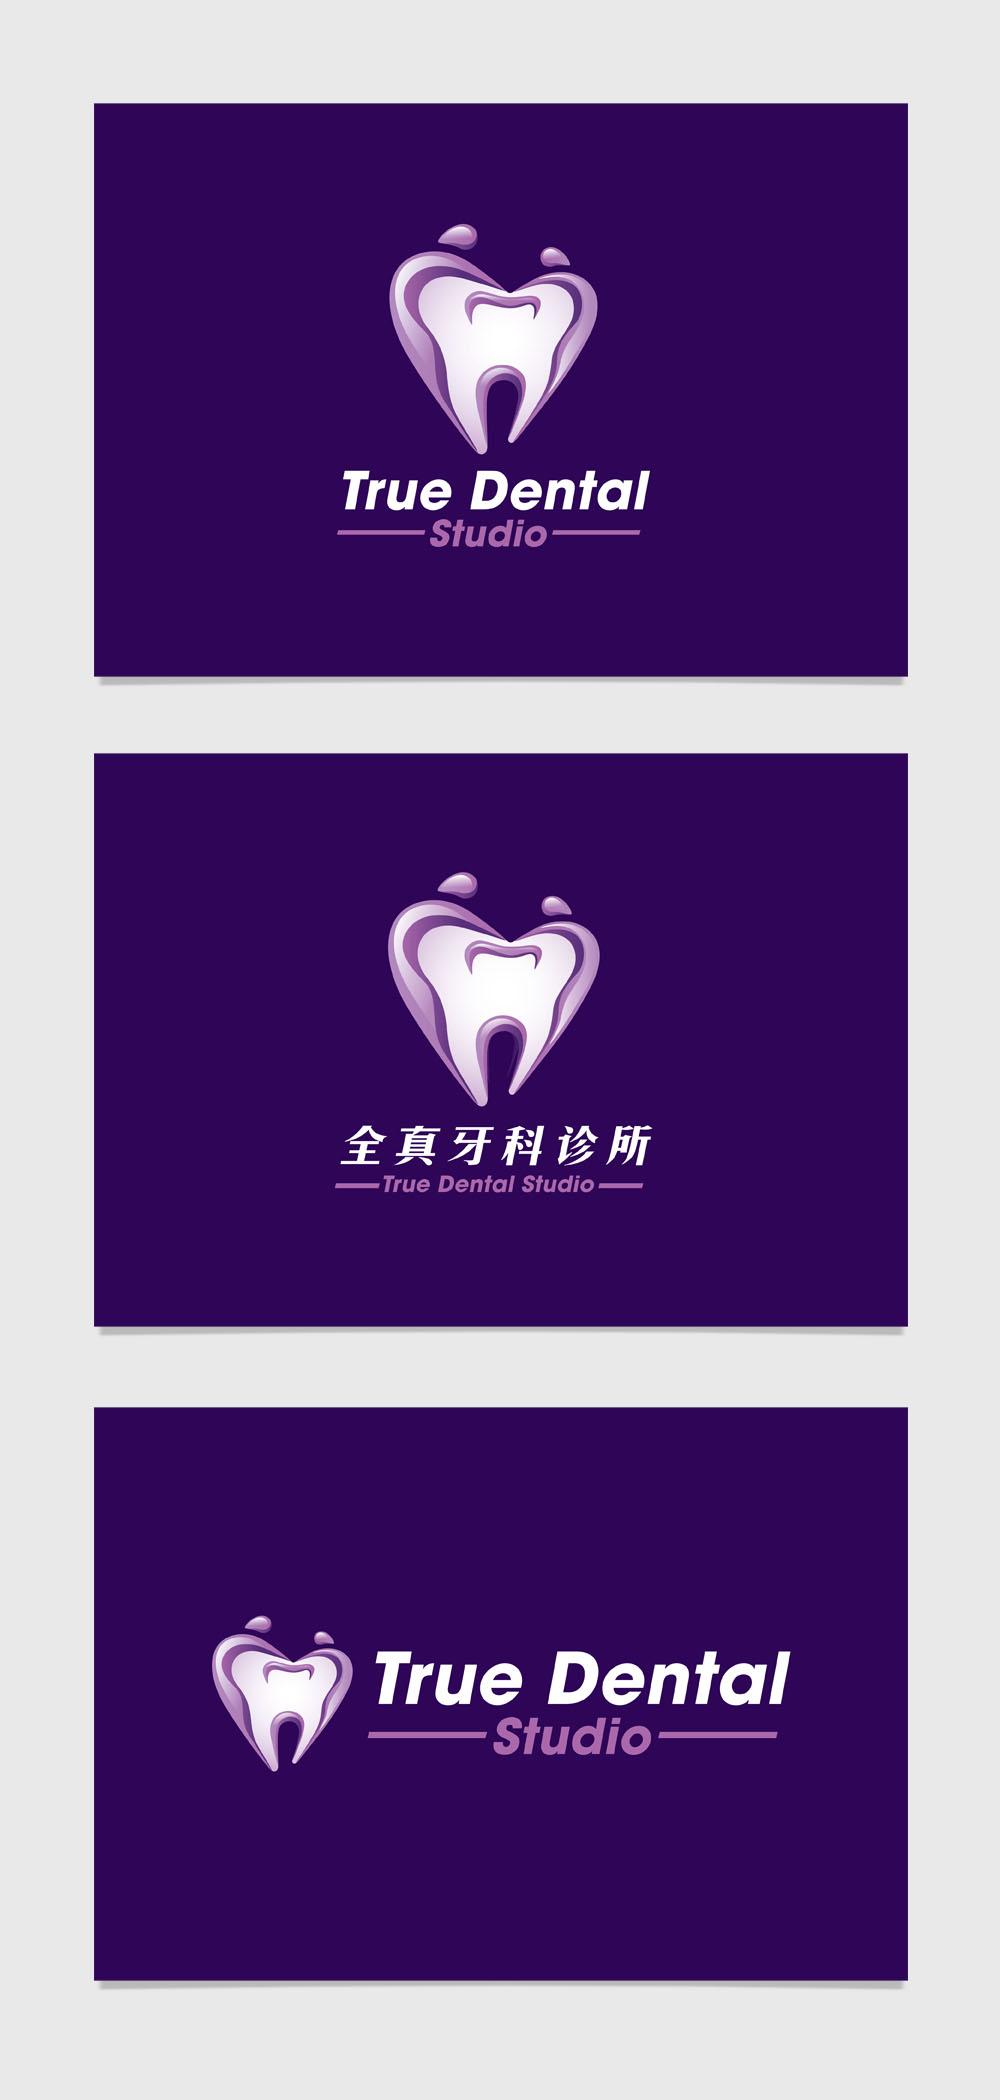 True Dental Brand Design